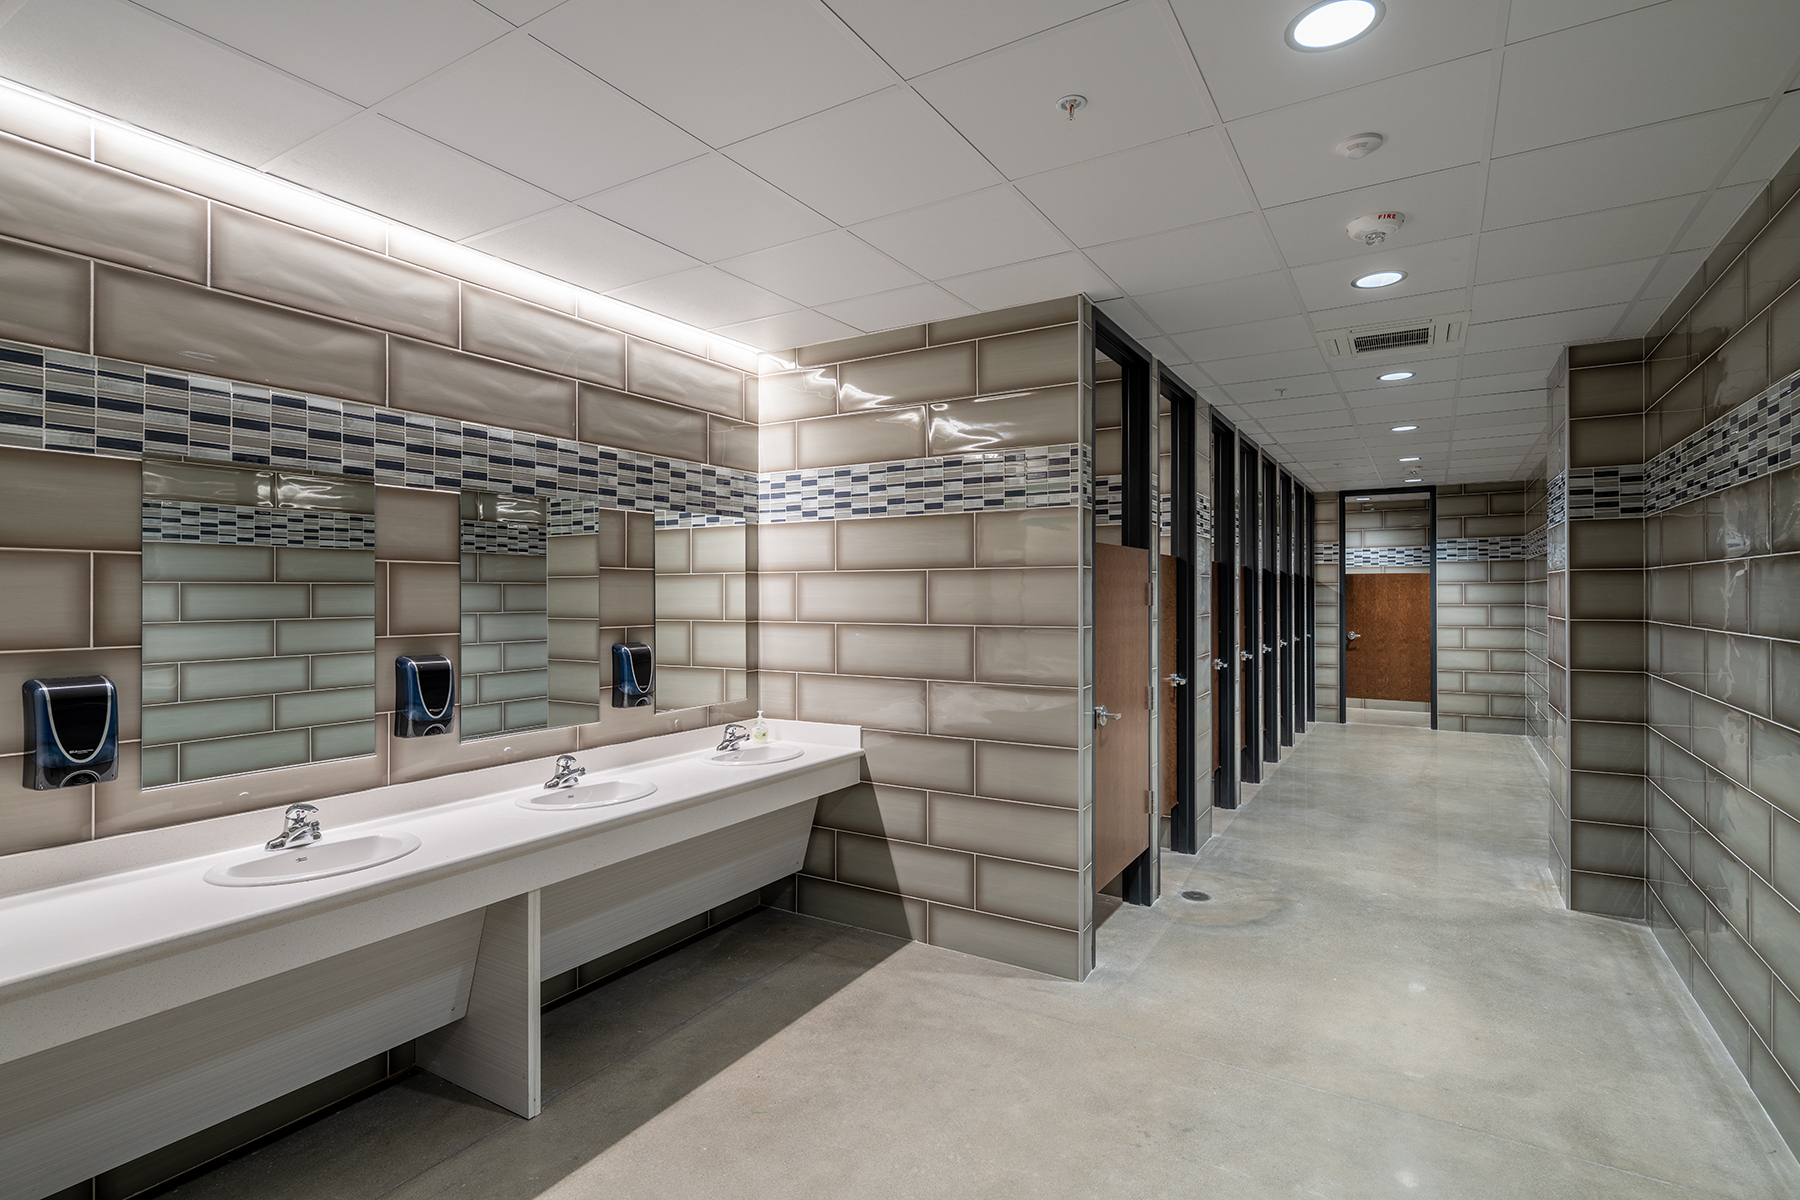 Little Rock Christian Academy Warrior Arena – Restrooms